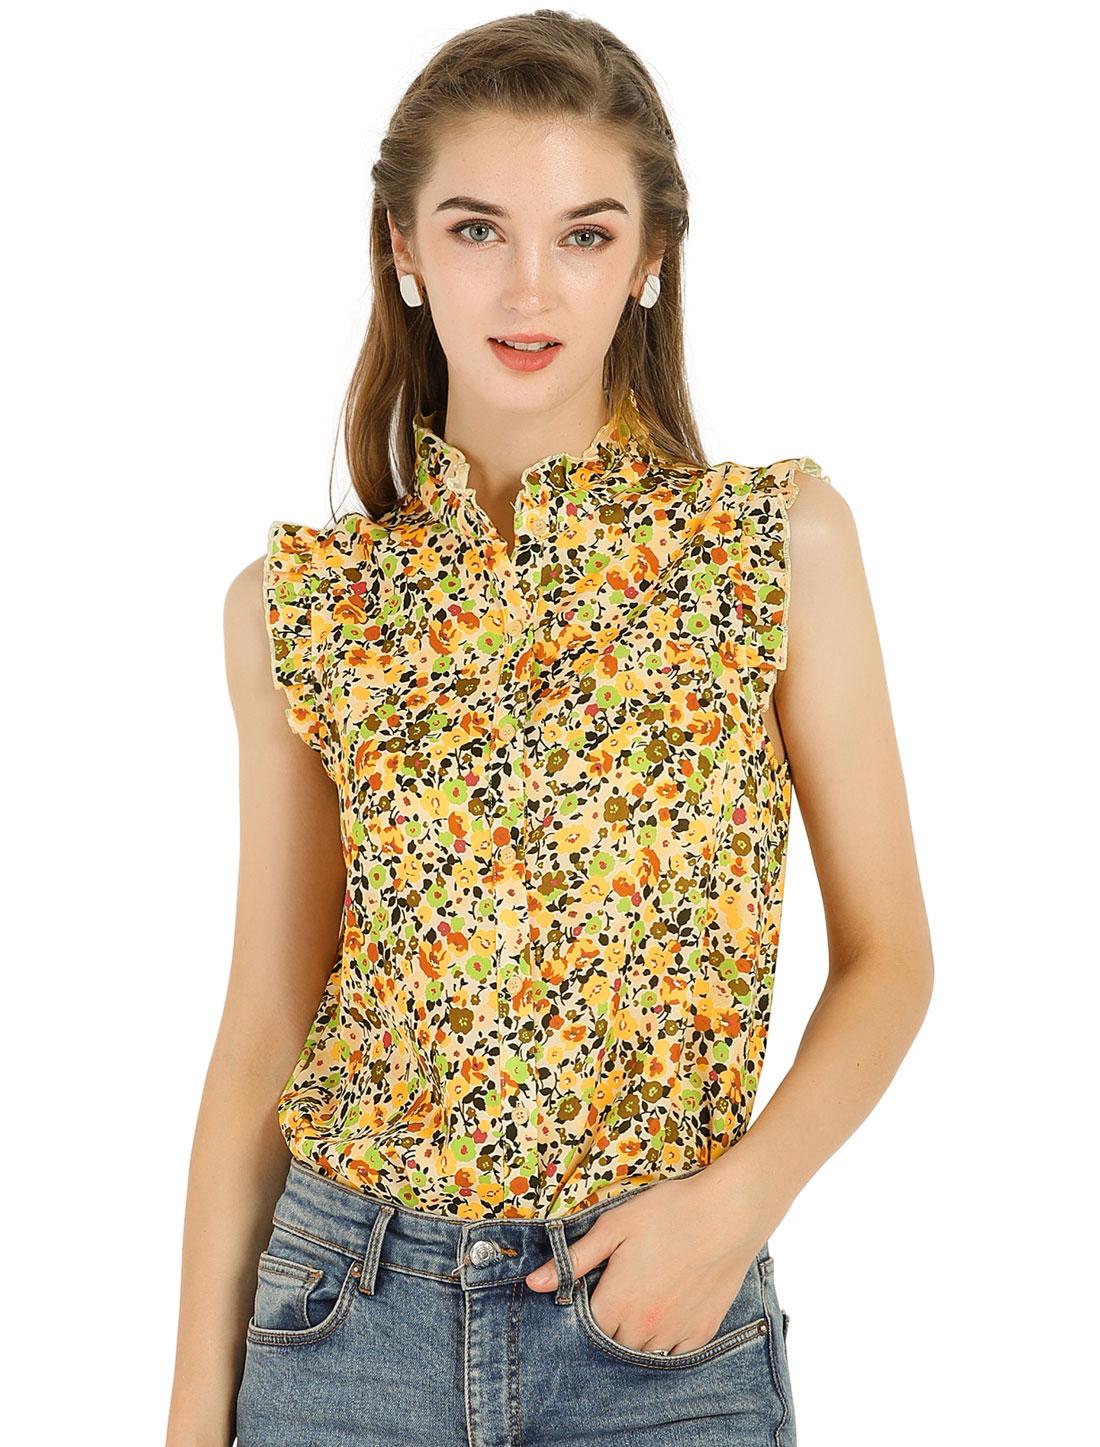 Allegra K Women's Sleeveless Ruffle Neckline Floral Top Yellow M